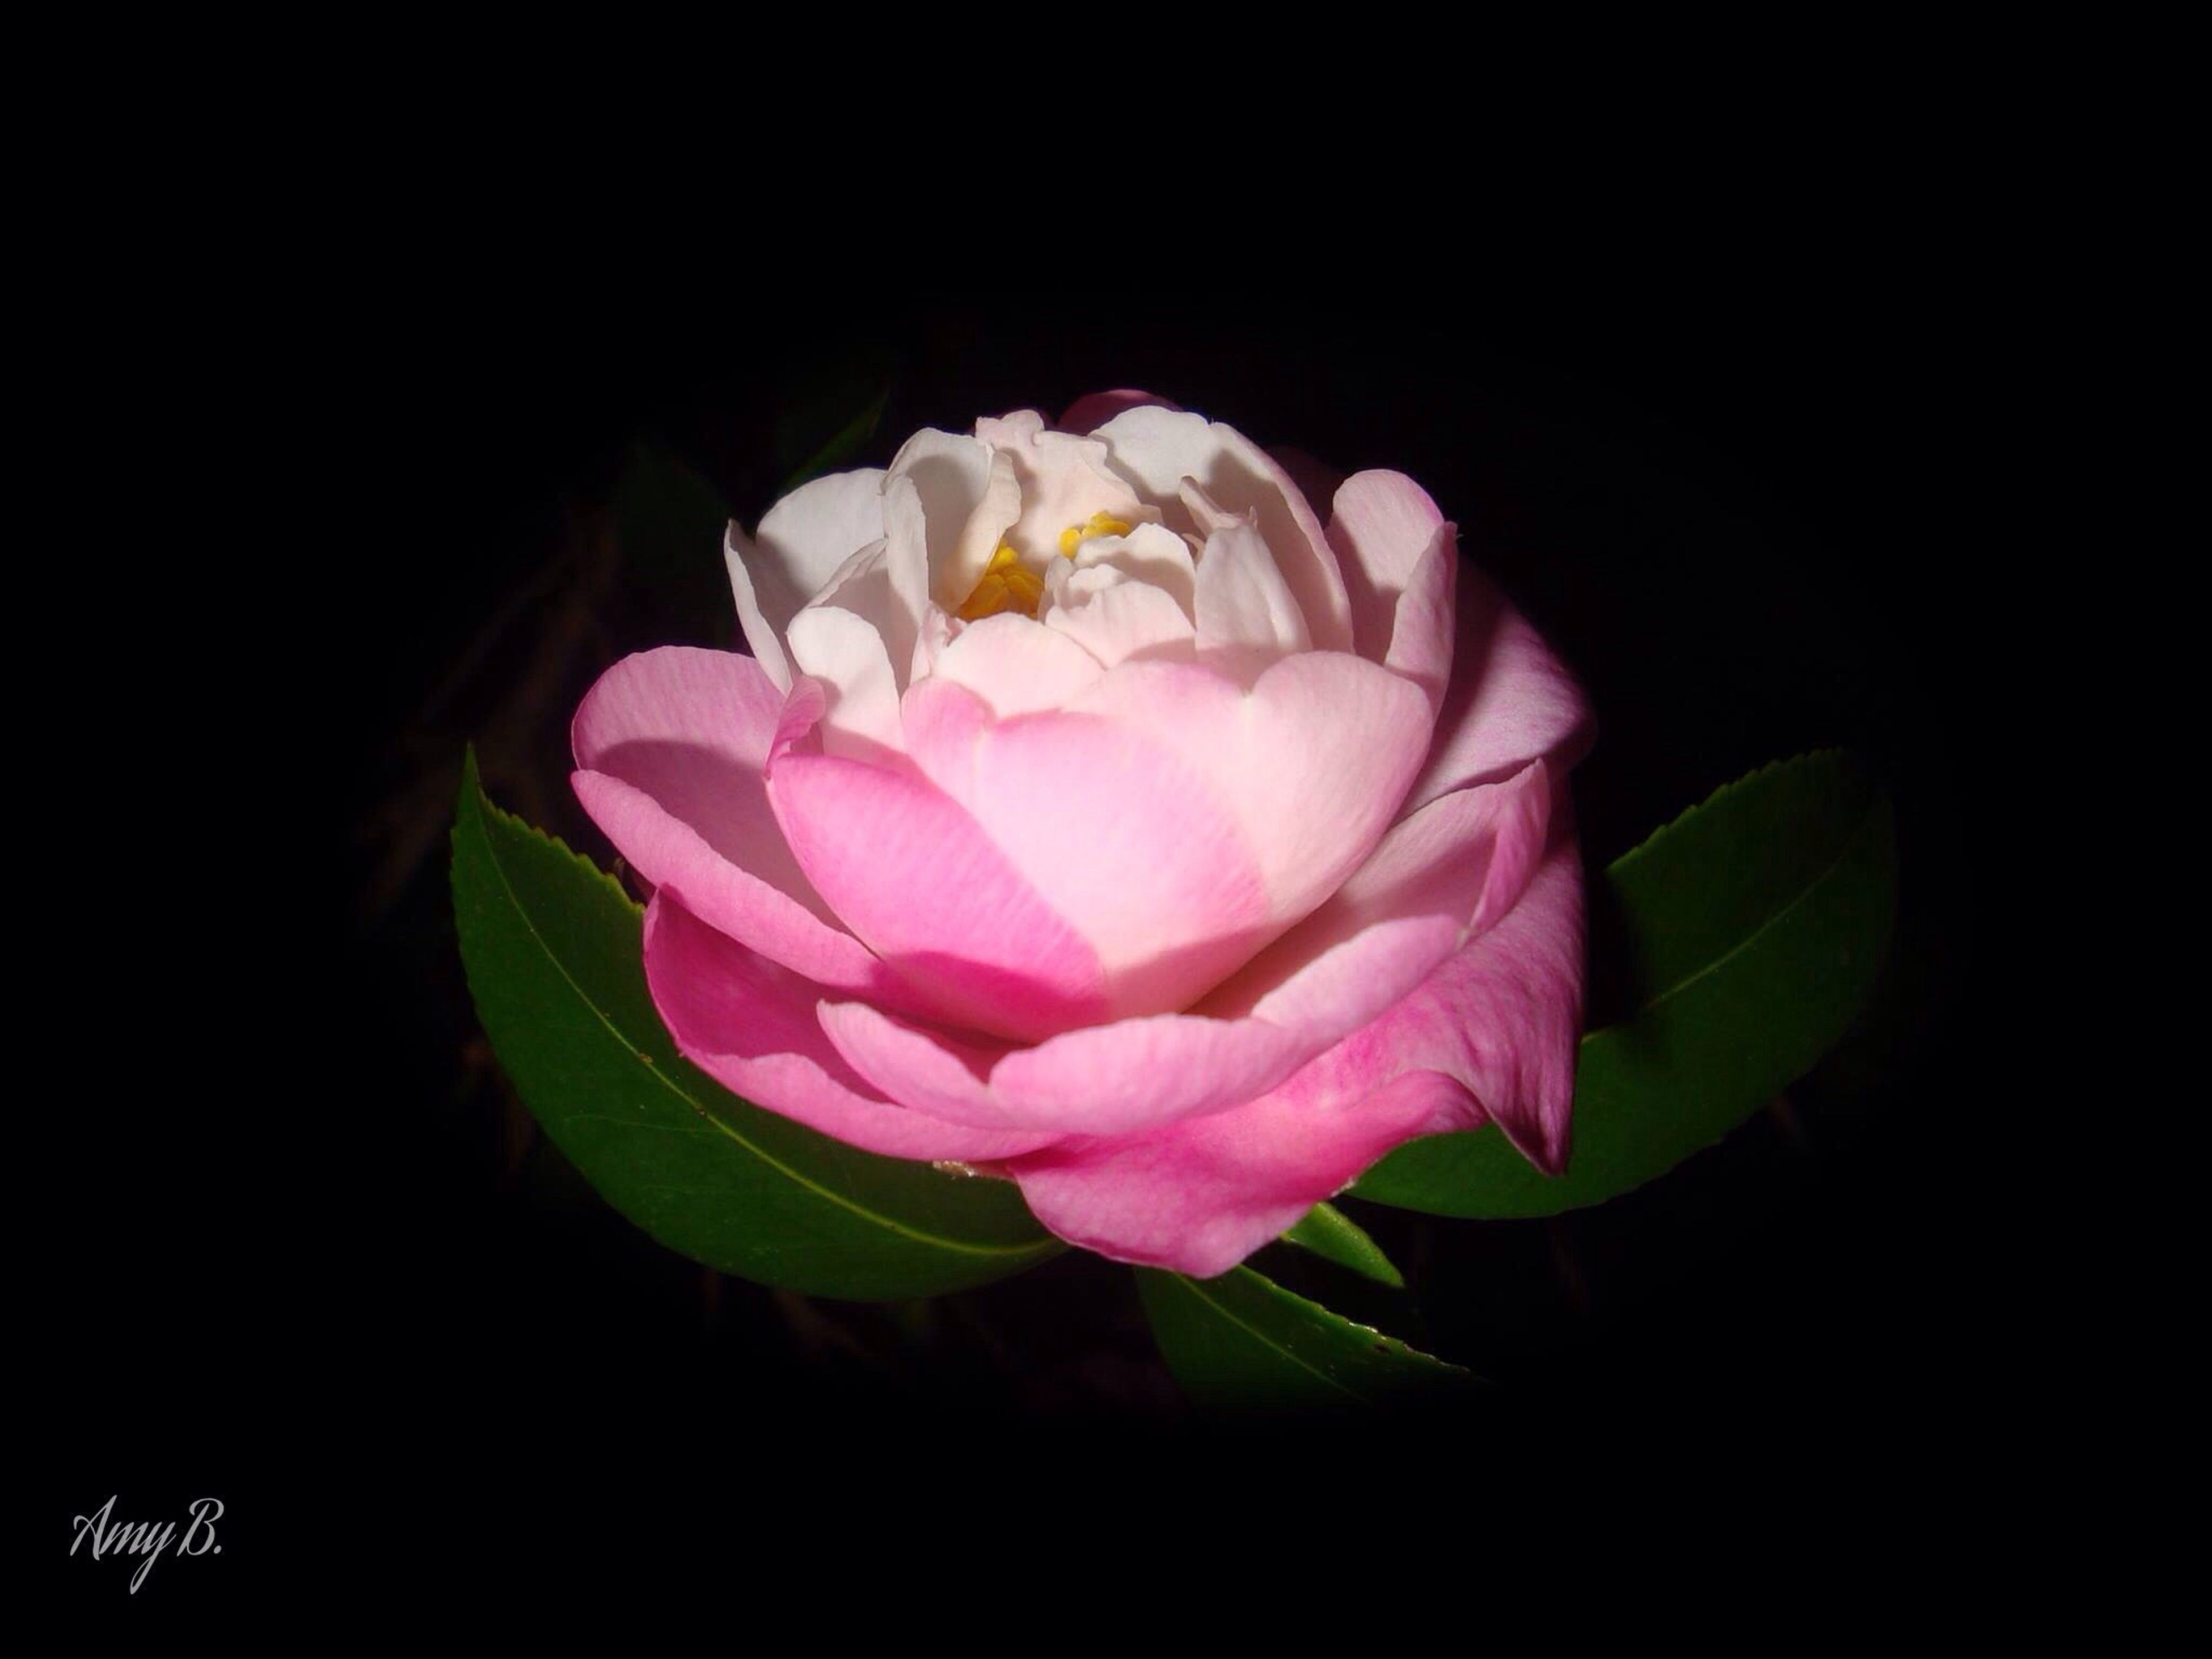 flower, petal, freshness, flower head, fragility, beauty in nature, black background, close-up, studio shot, pink color, growth, rose - flower, single flower, nature, blooming, rose, plant, leaf, blossom, no people